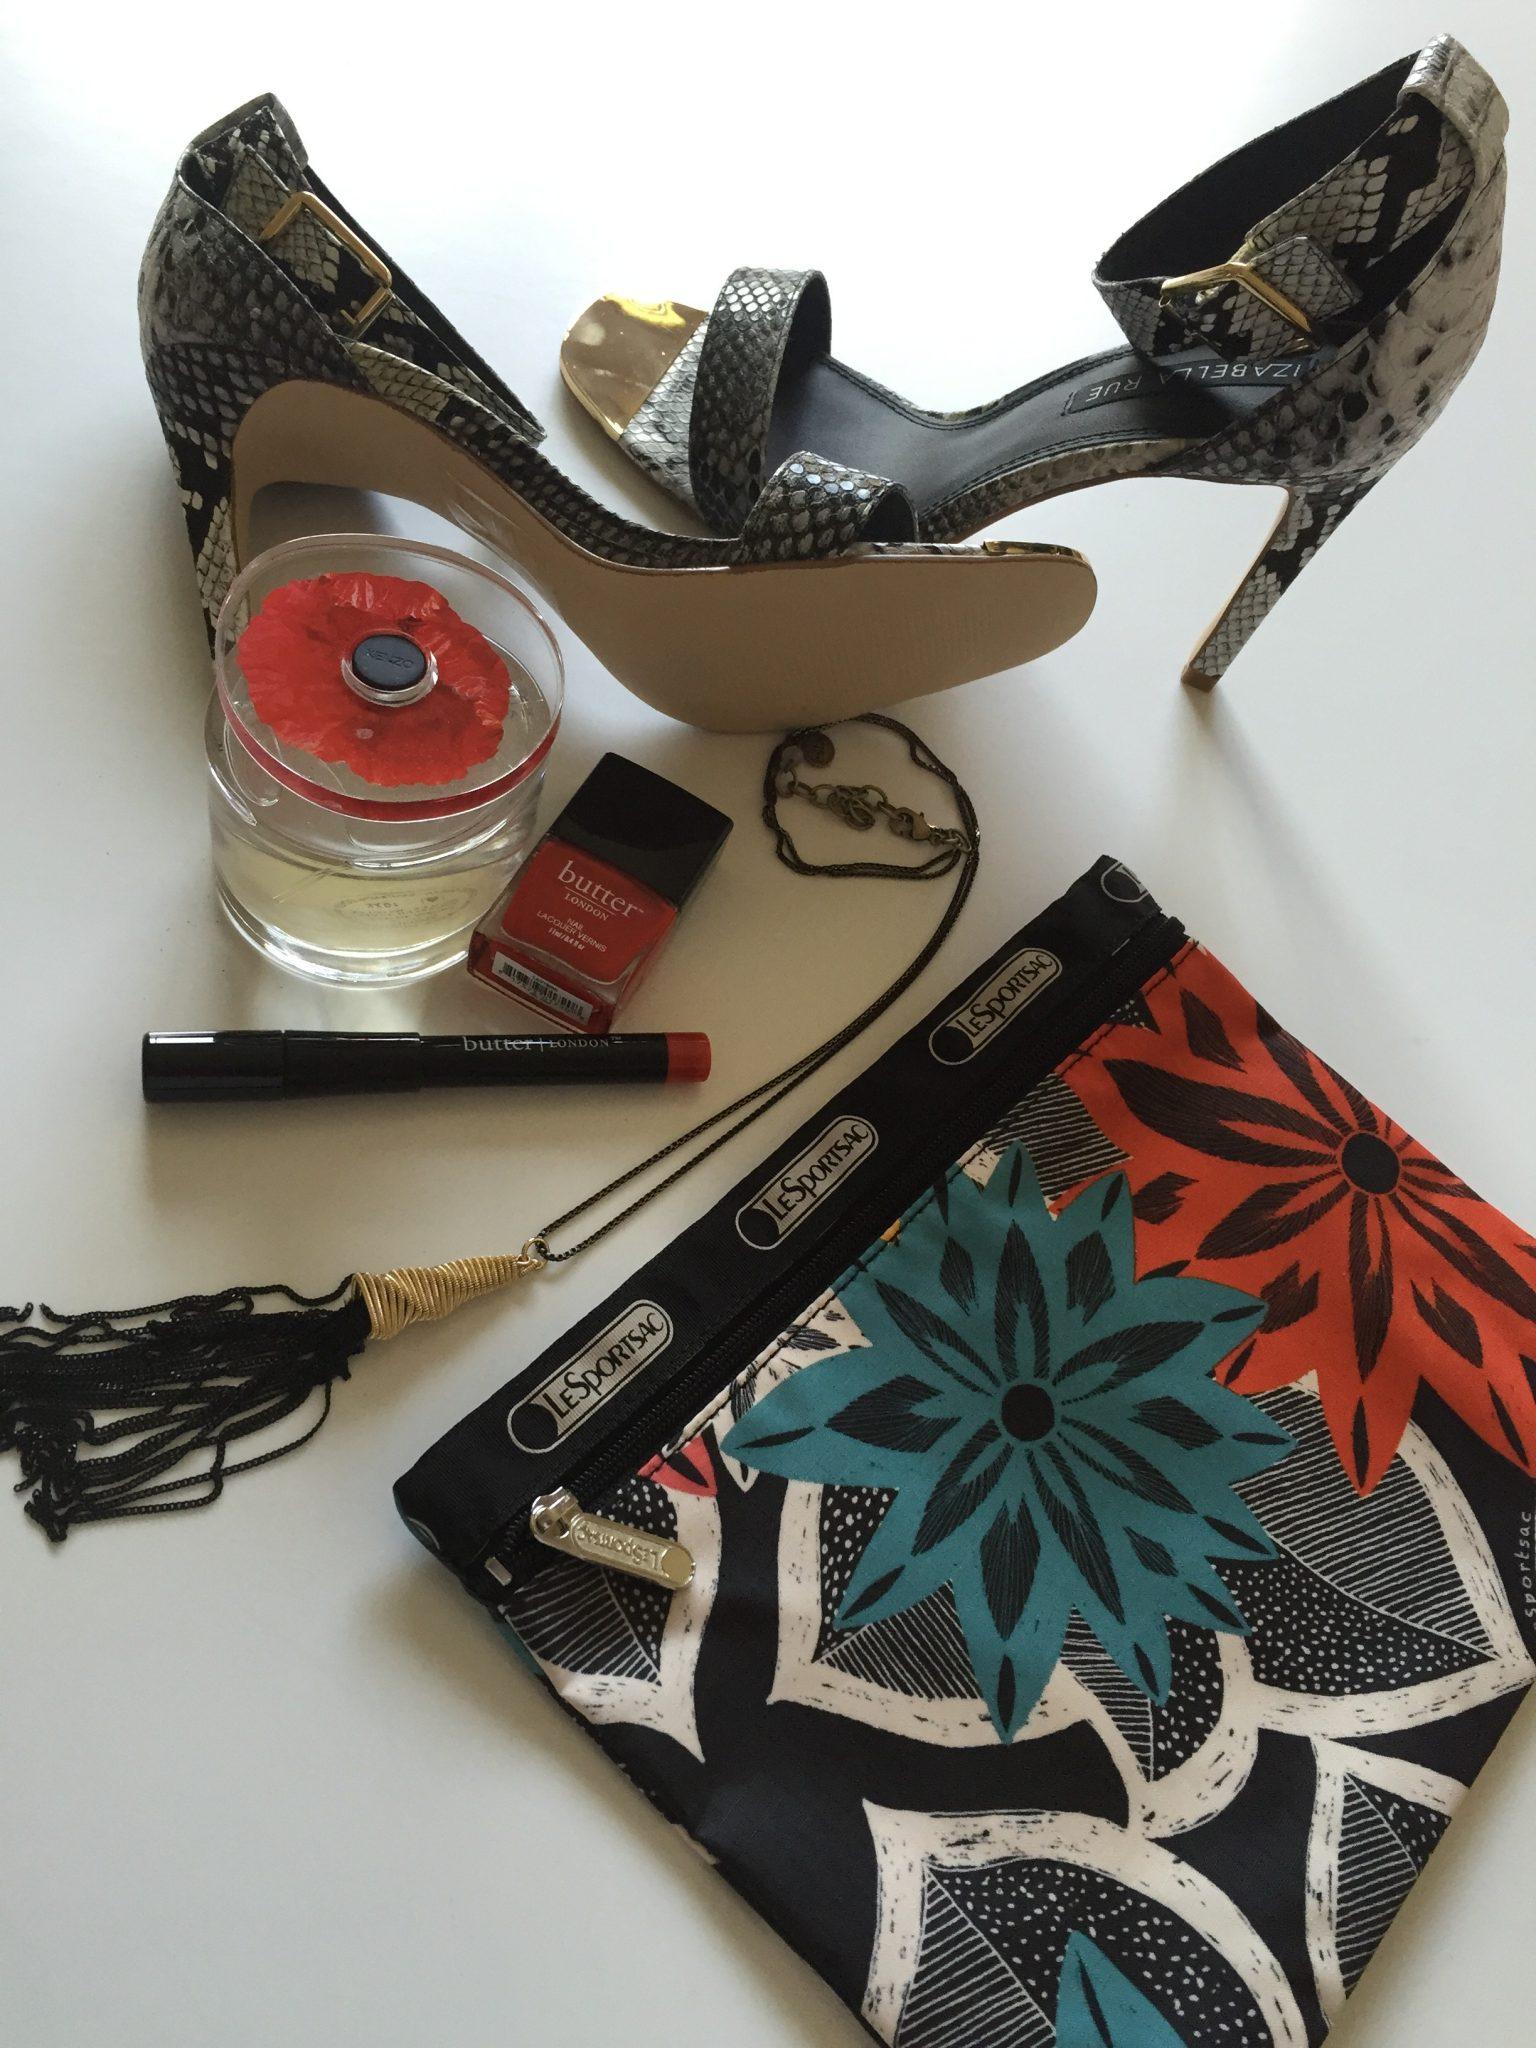 Fashion & Beauty Items I'm Currently Loving!